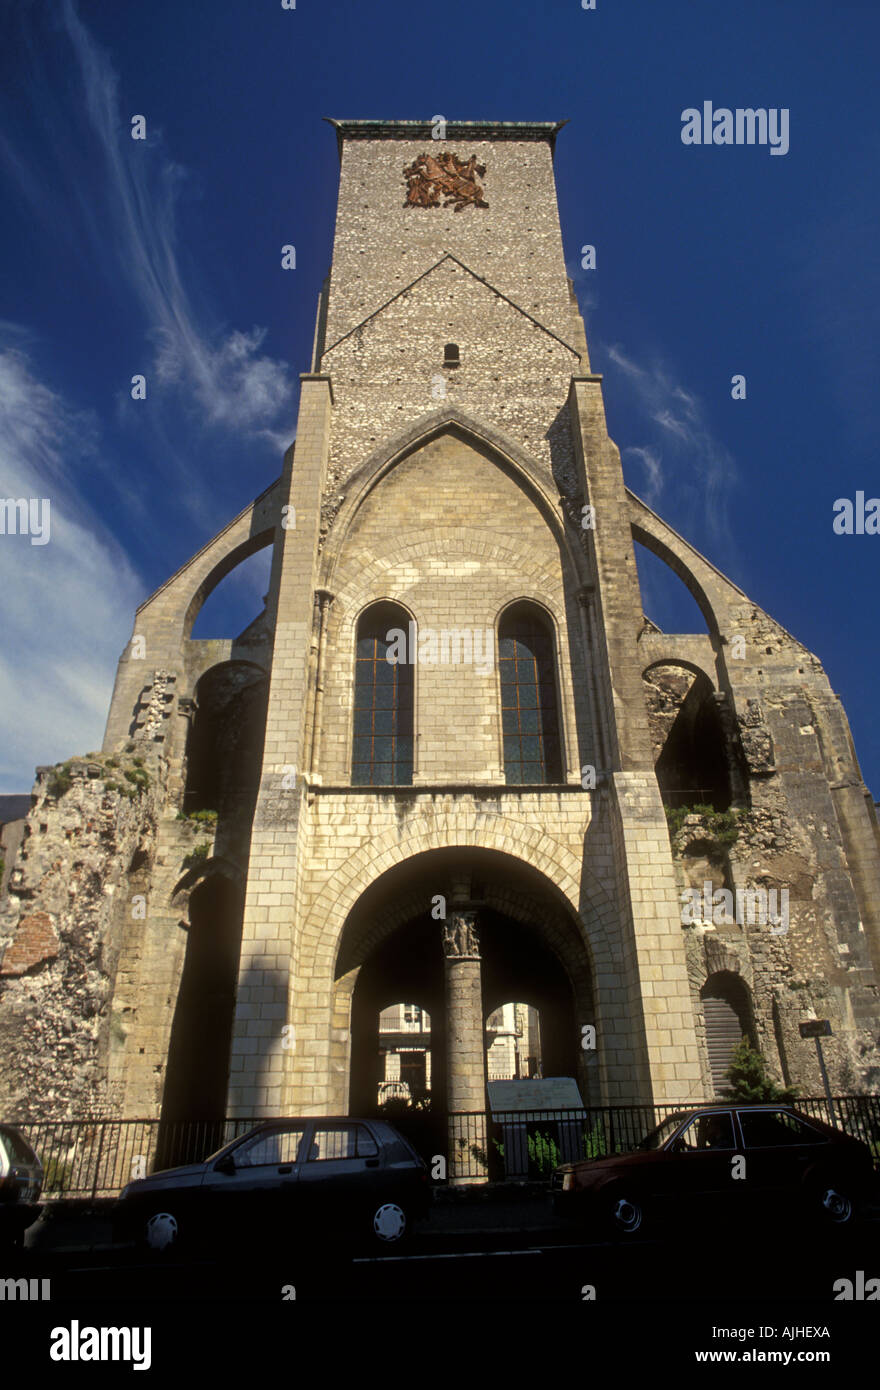 Saint Martin Basilica, St Martin Basilica, neo-Romanesque, neo-Romanesque architecture, Tours, Centre Region, France, Europe - Stock Image